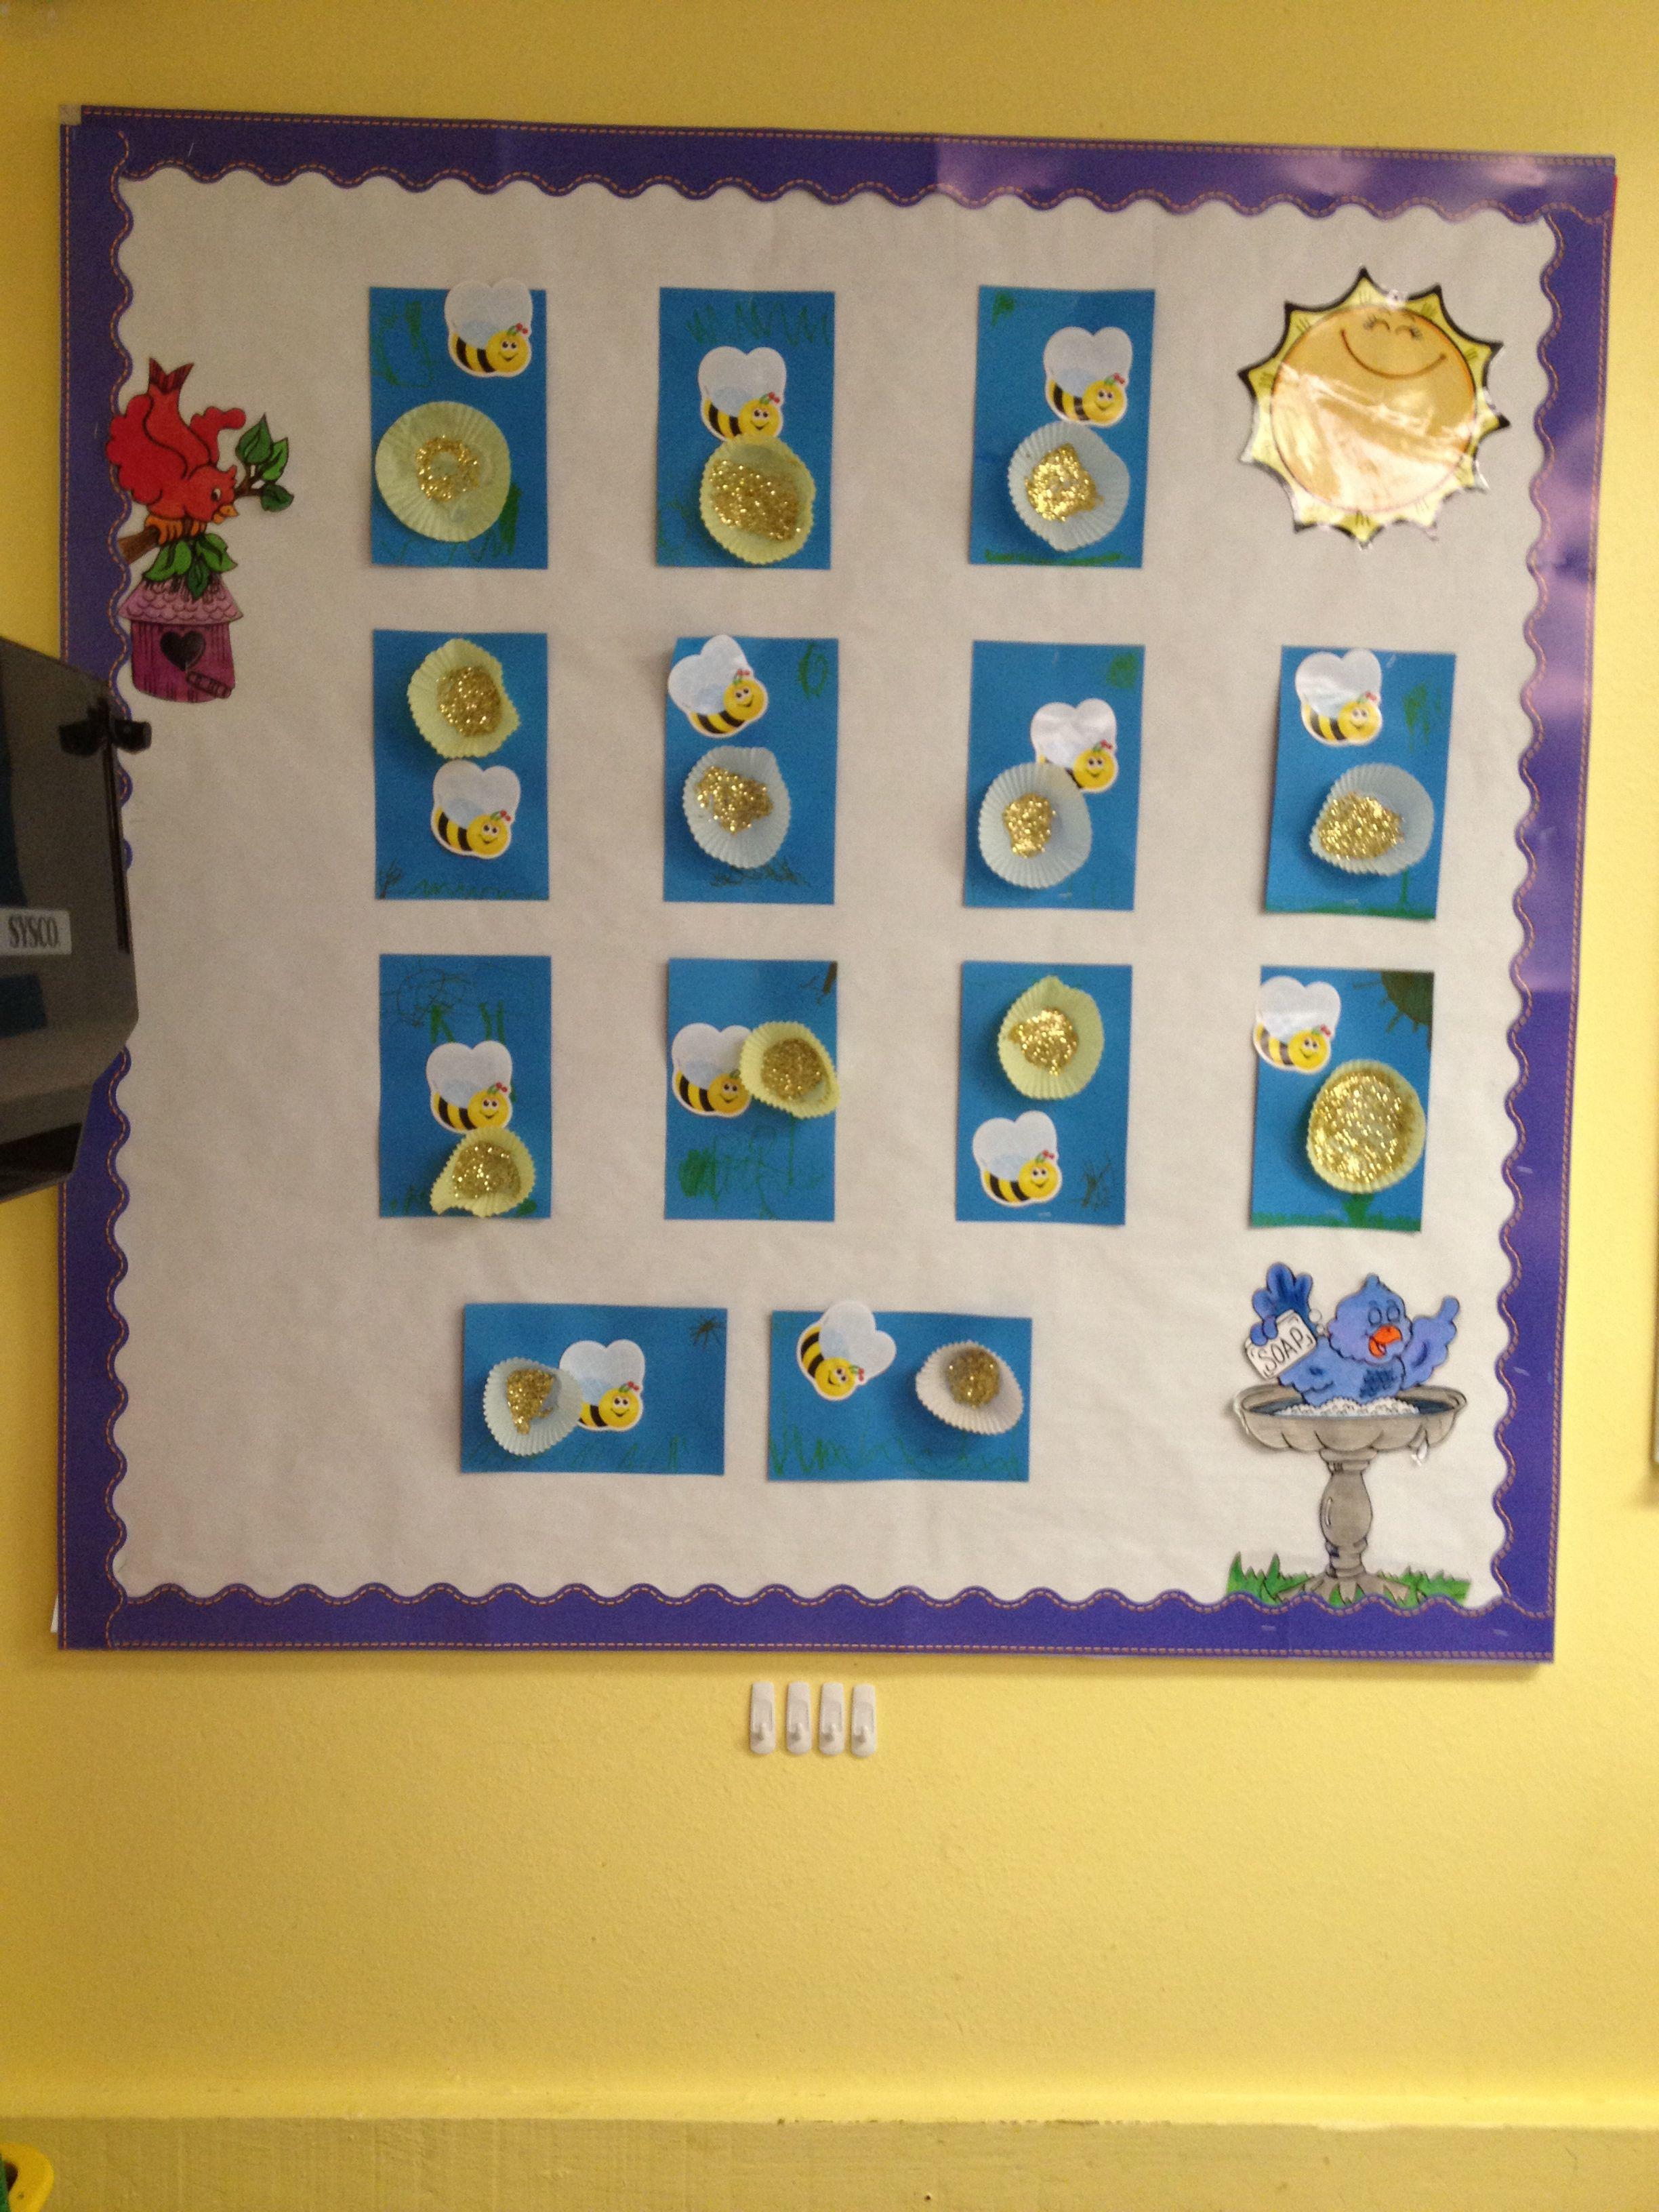 Pre Planned Flower Garden Designs: My Preschool Bulletin Board For May/Spring. Bee